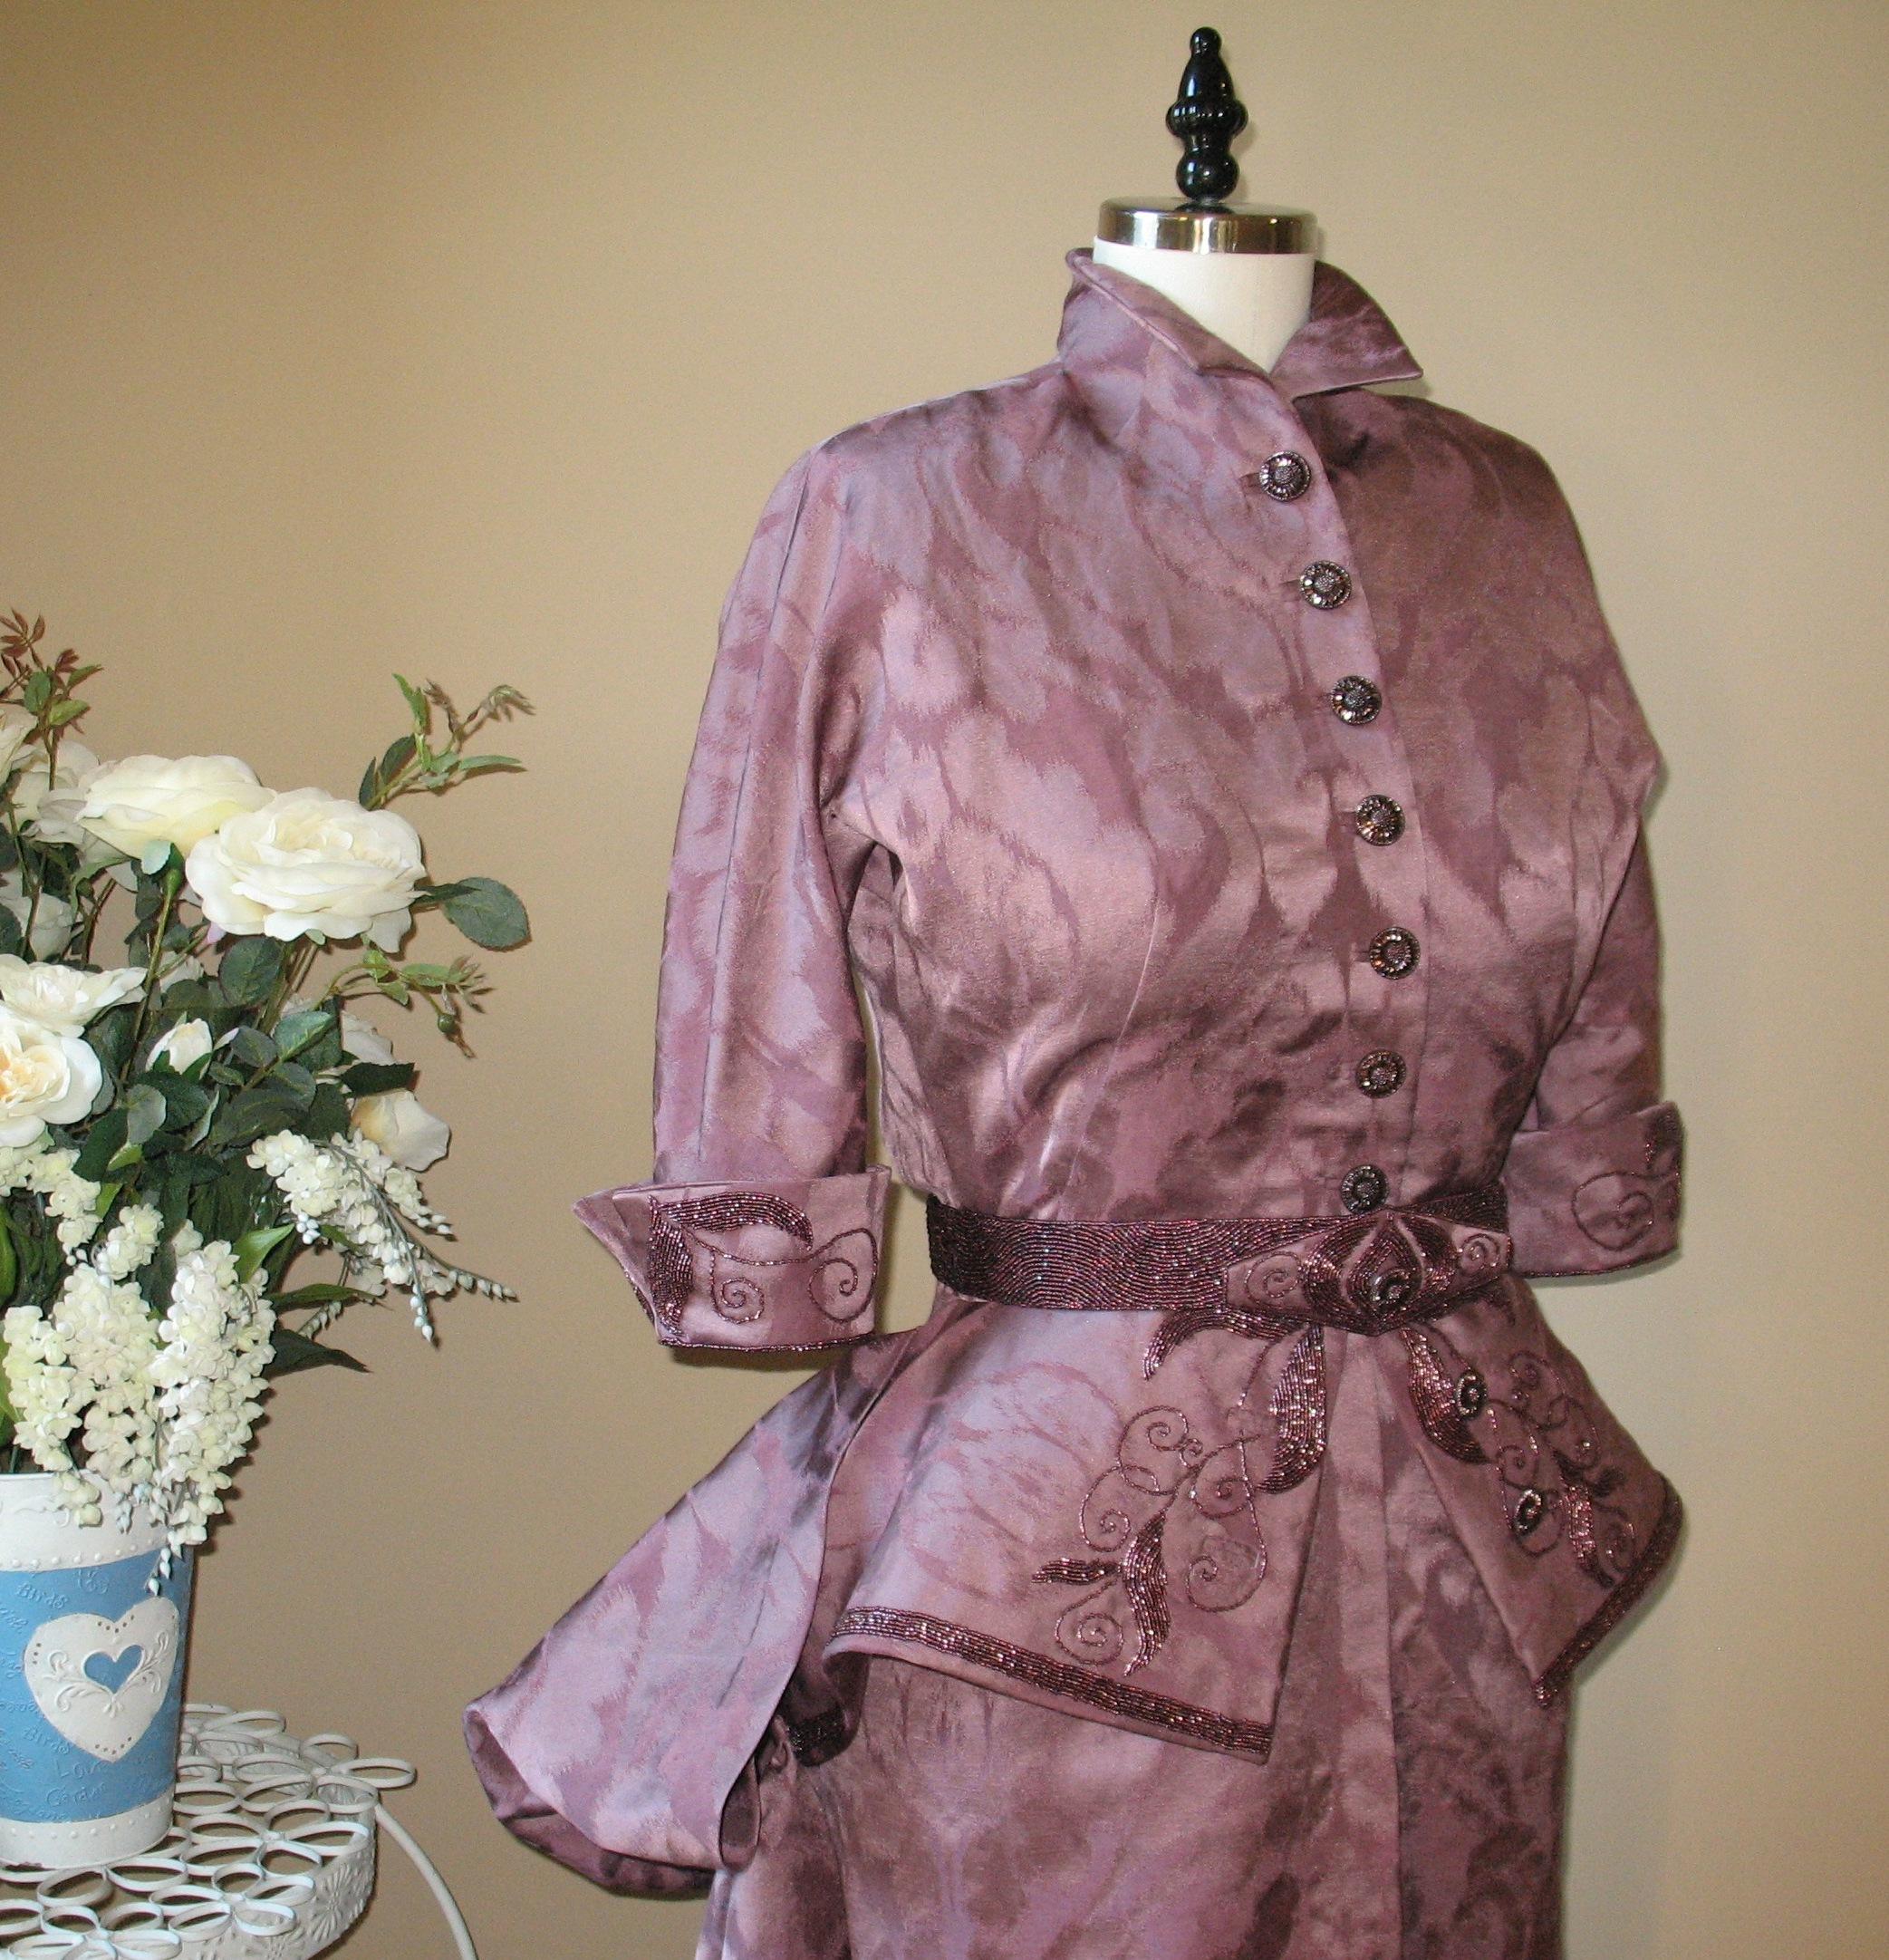 Making the Dream Dress